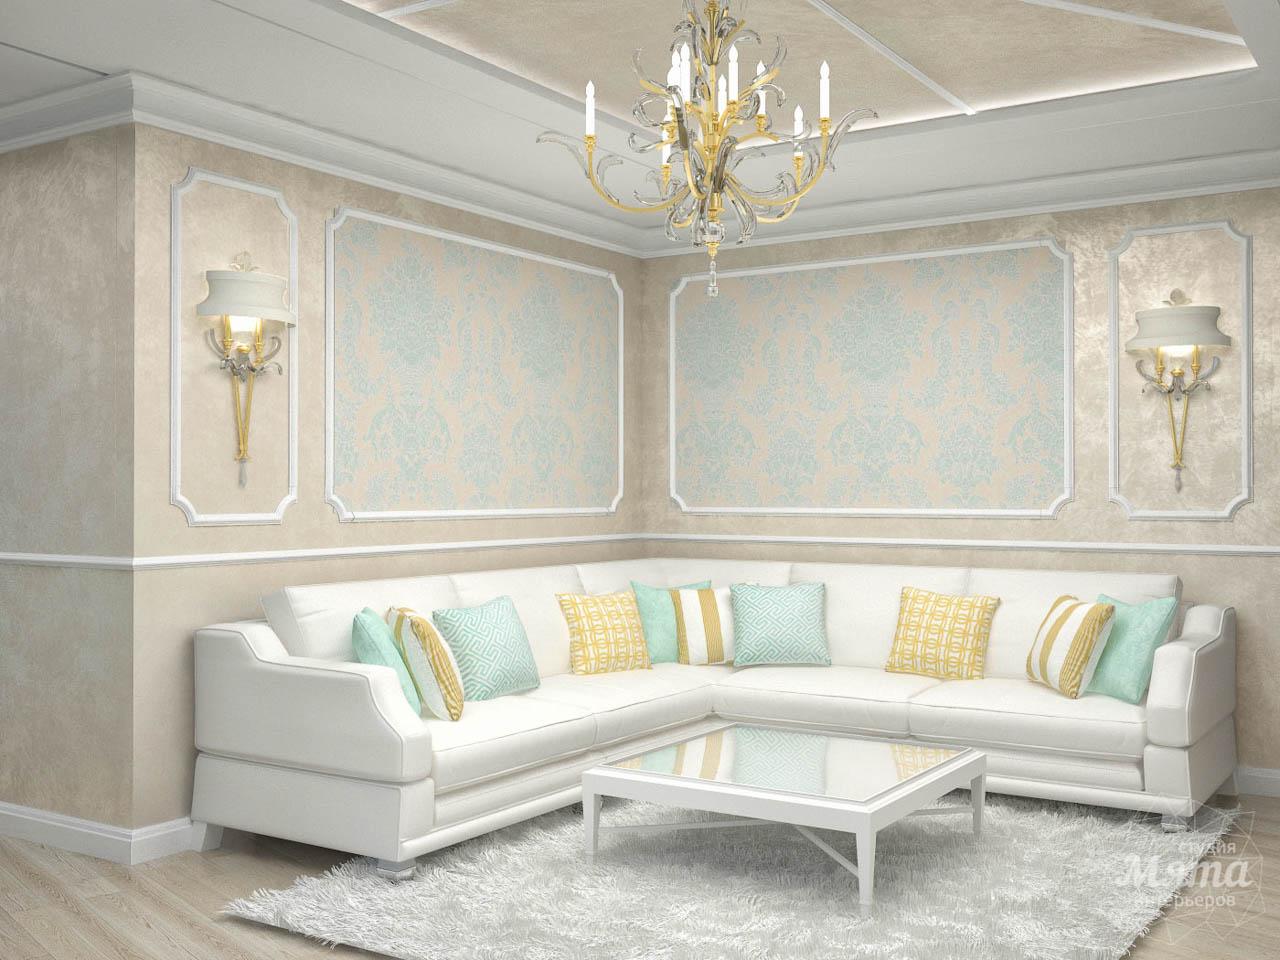 Дизайн интерьера и ремонт трехкомнатной квартиры по ул. 8 Марта 190 img1122398126